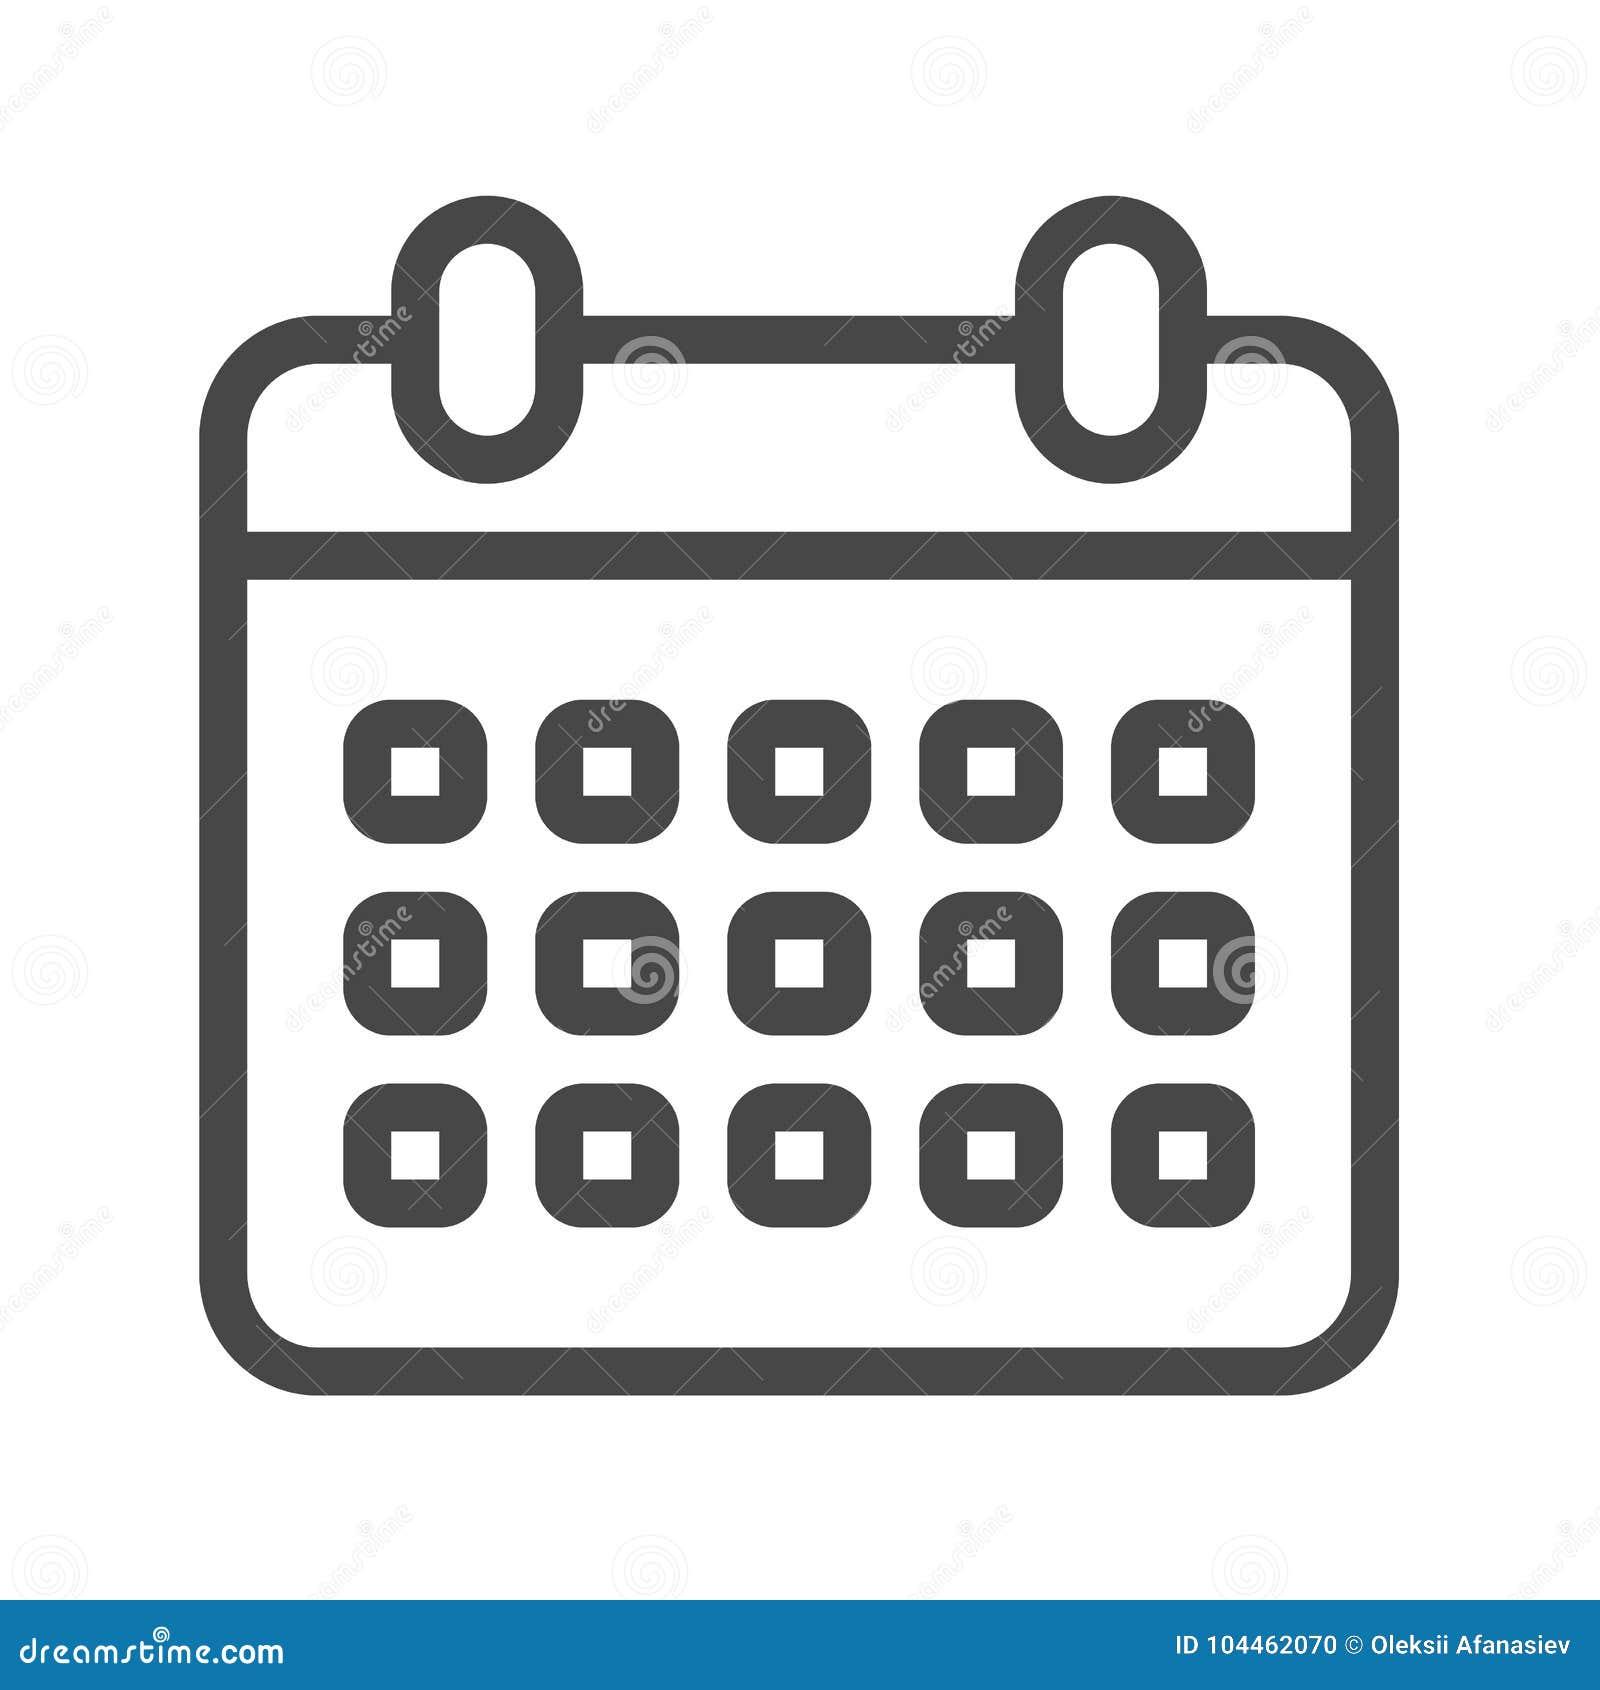 Calendario Vector.Linea Fina Icono Del Calendario Del Vector Ilustracion Del Vector